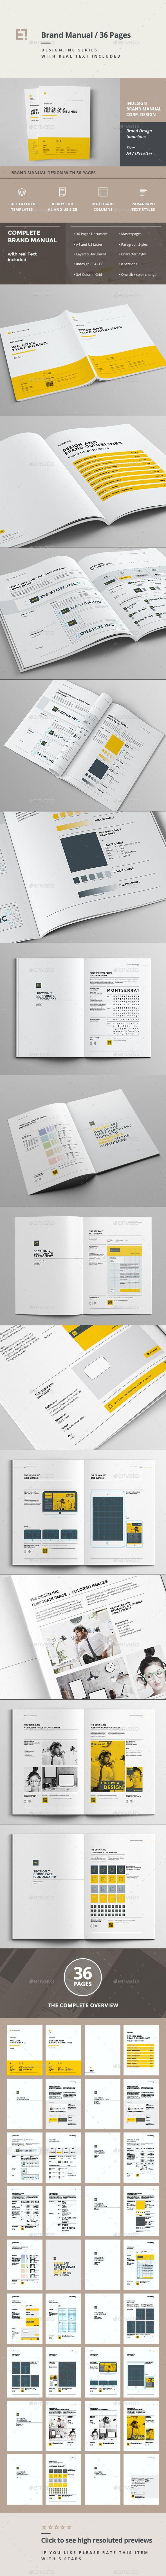 Doc Manual Design Templates Doc1906543 Manual Design – Manual Format Template